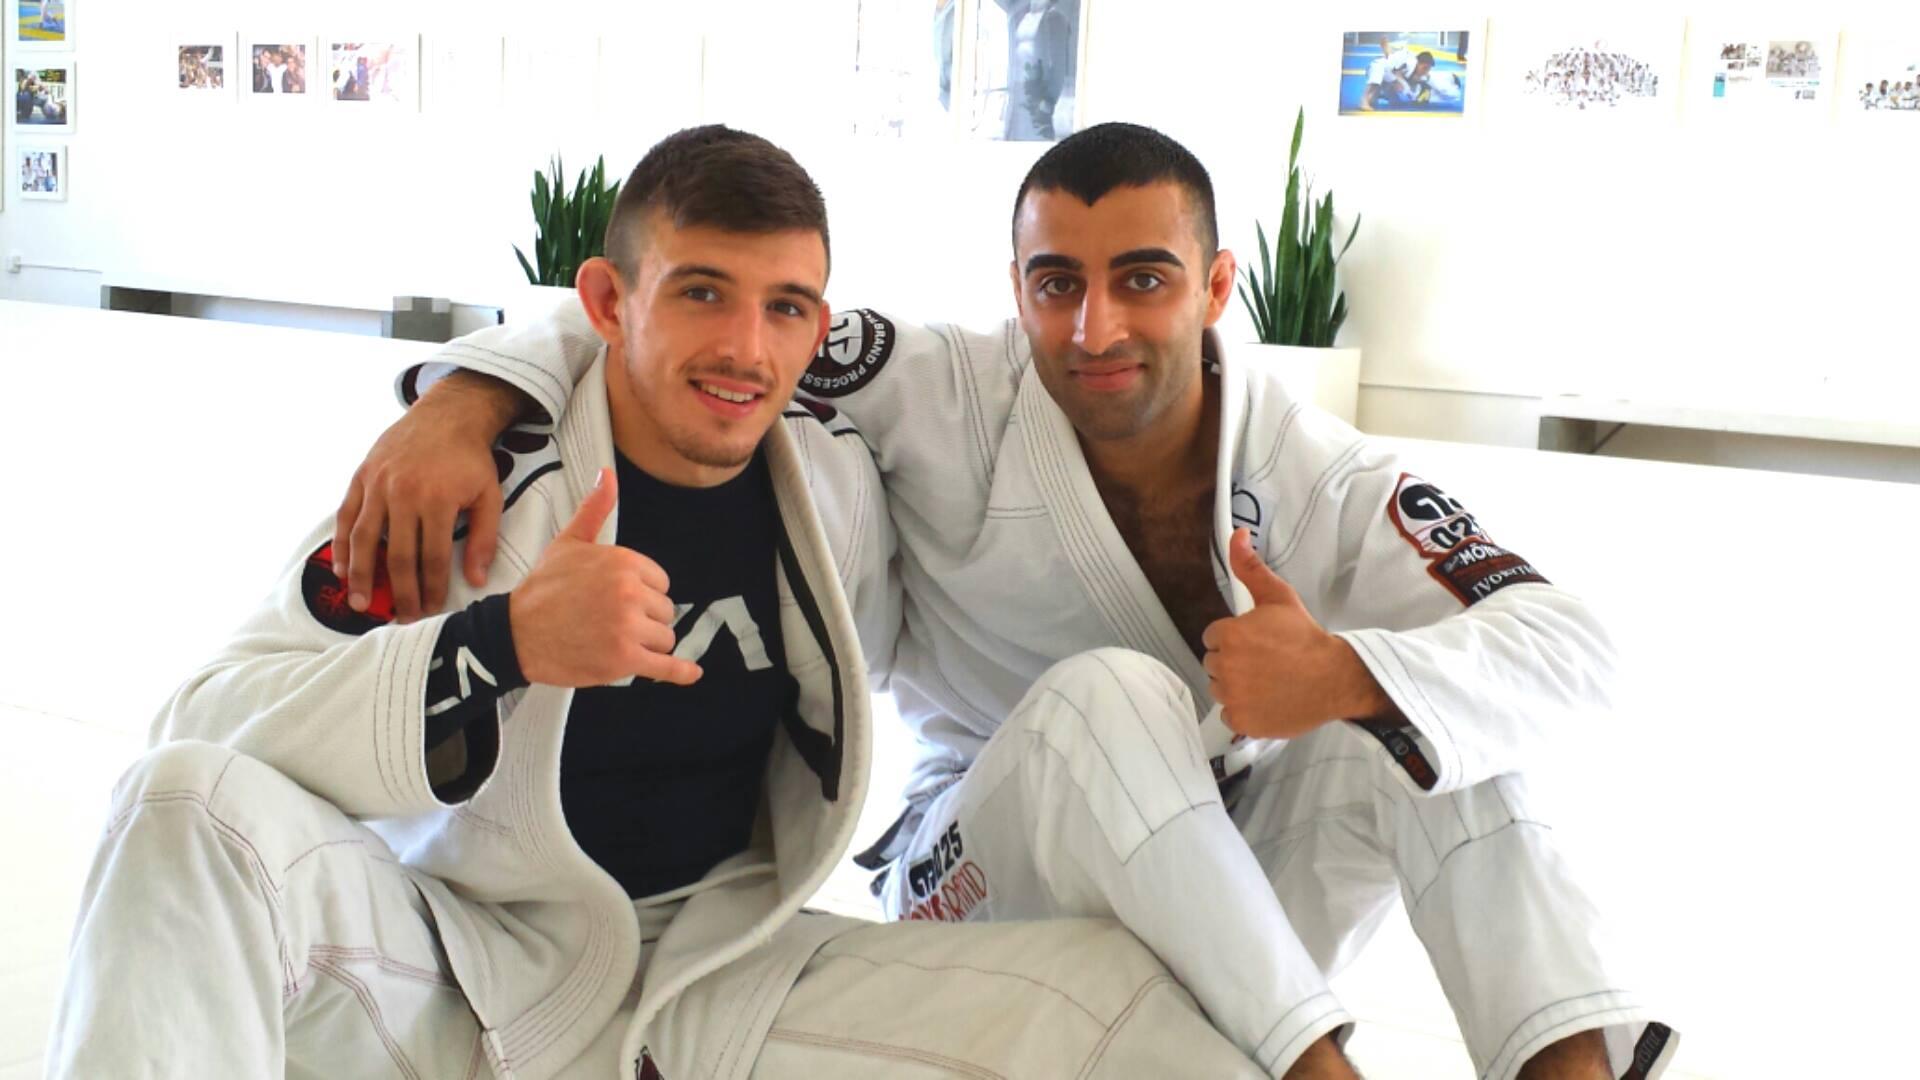 Training @ The Art Of Jiu Jitsu Academy (AOJ), Mendes ...